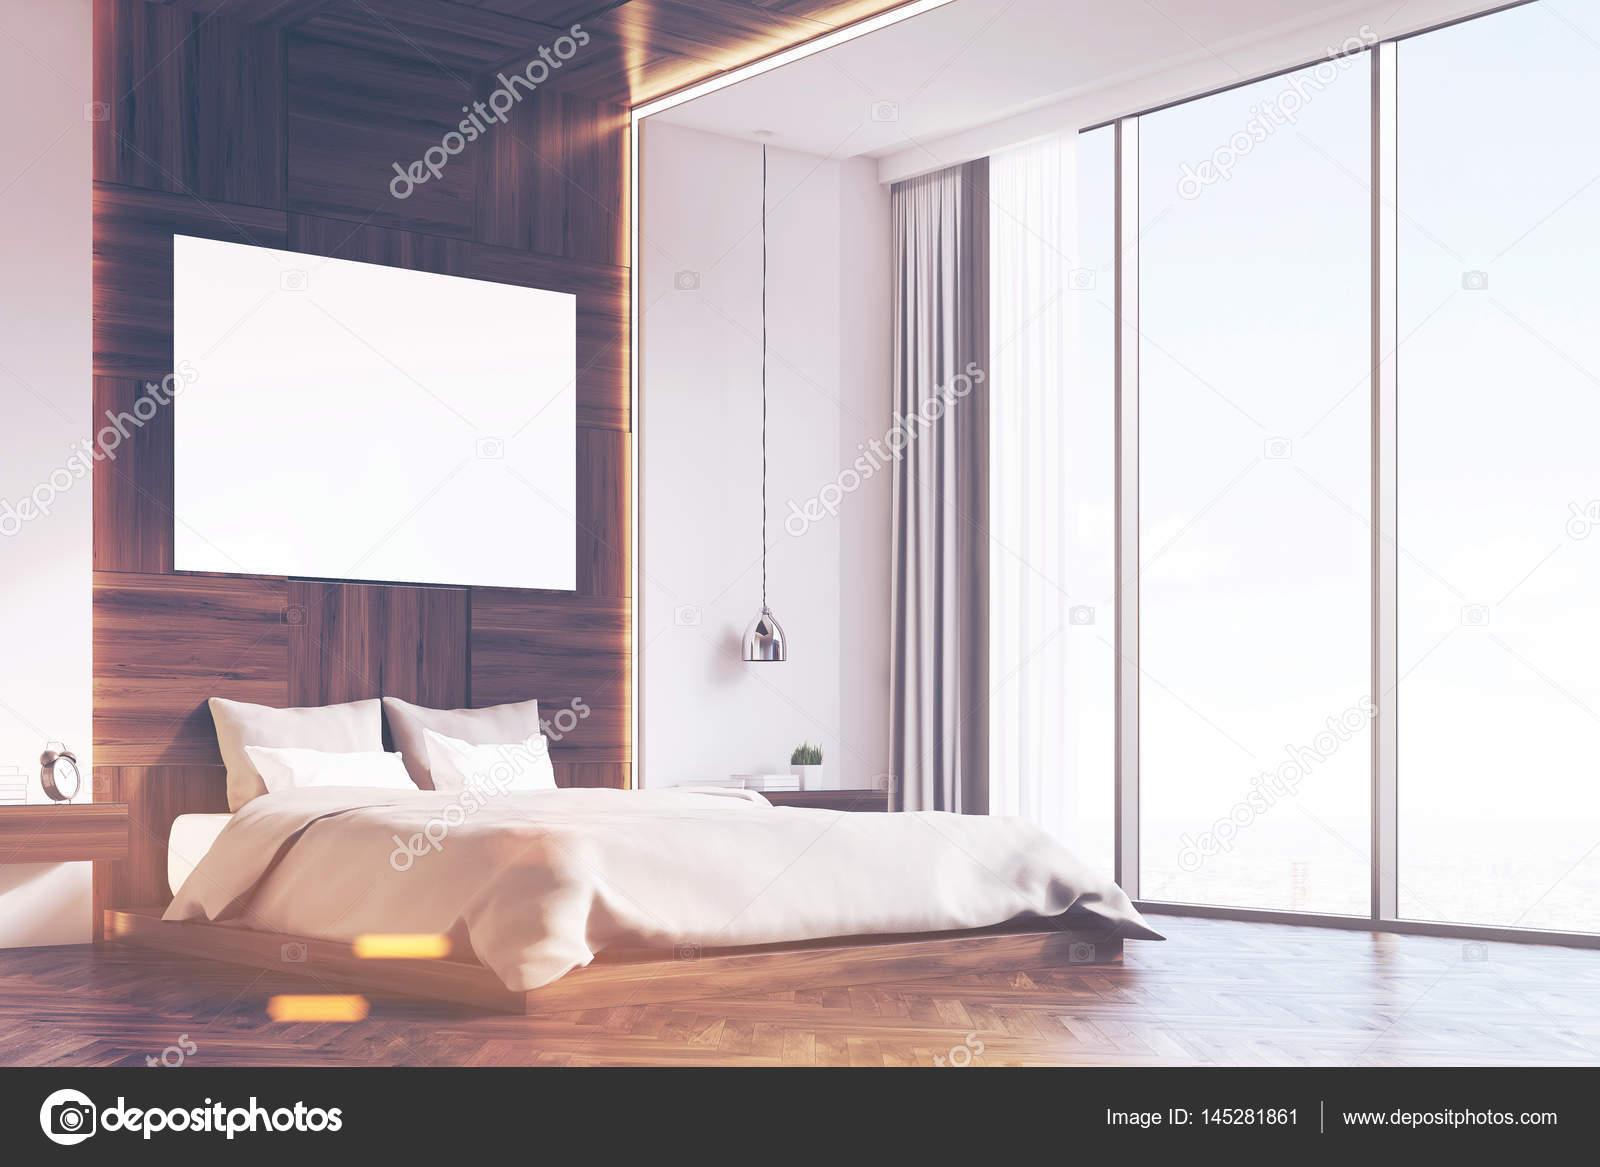 Slaapkamer Met Hout : Slaapkamer met foto hout hoek afgezwakt u2014 stockfoto